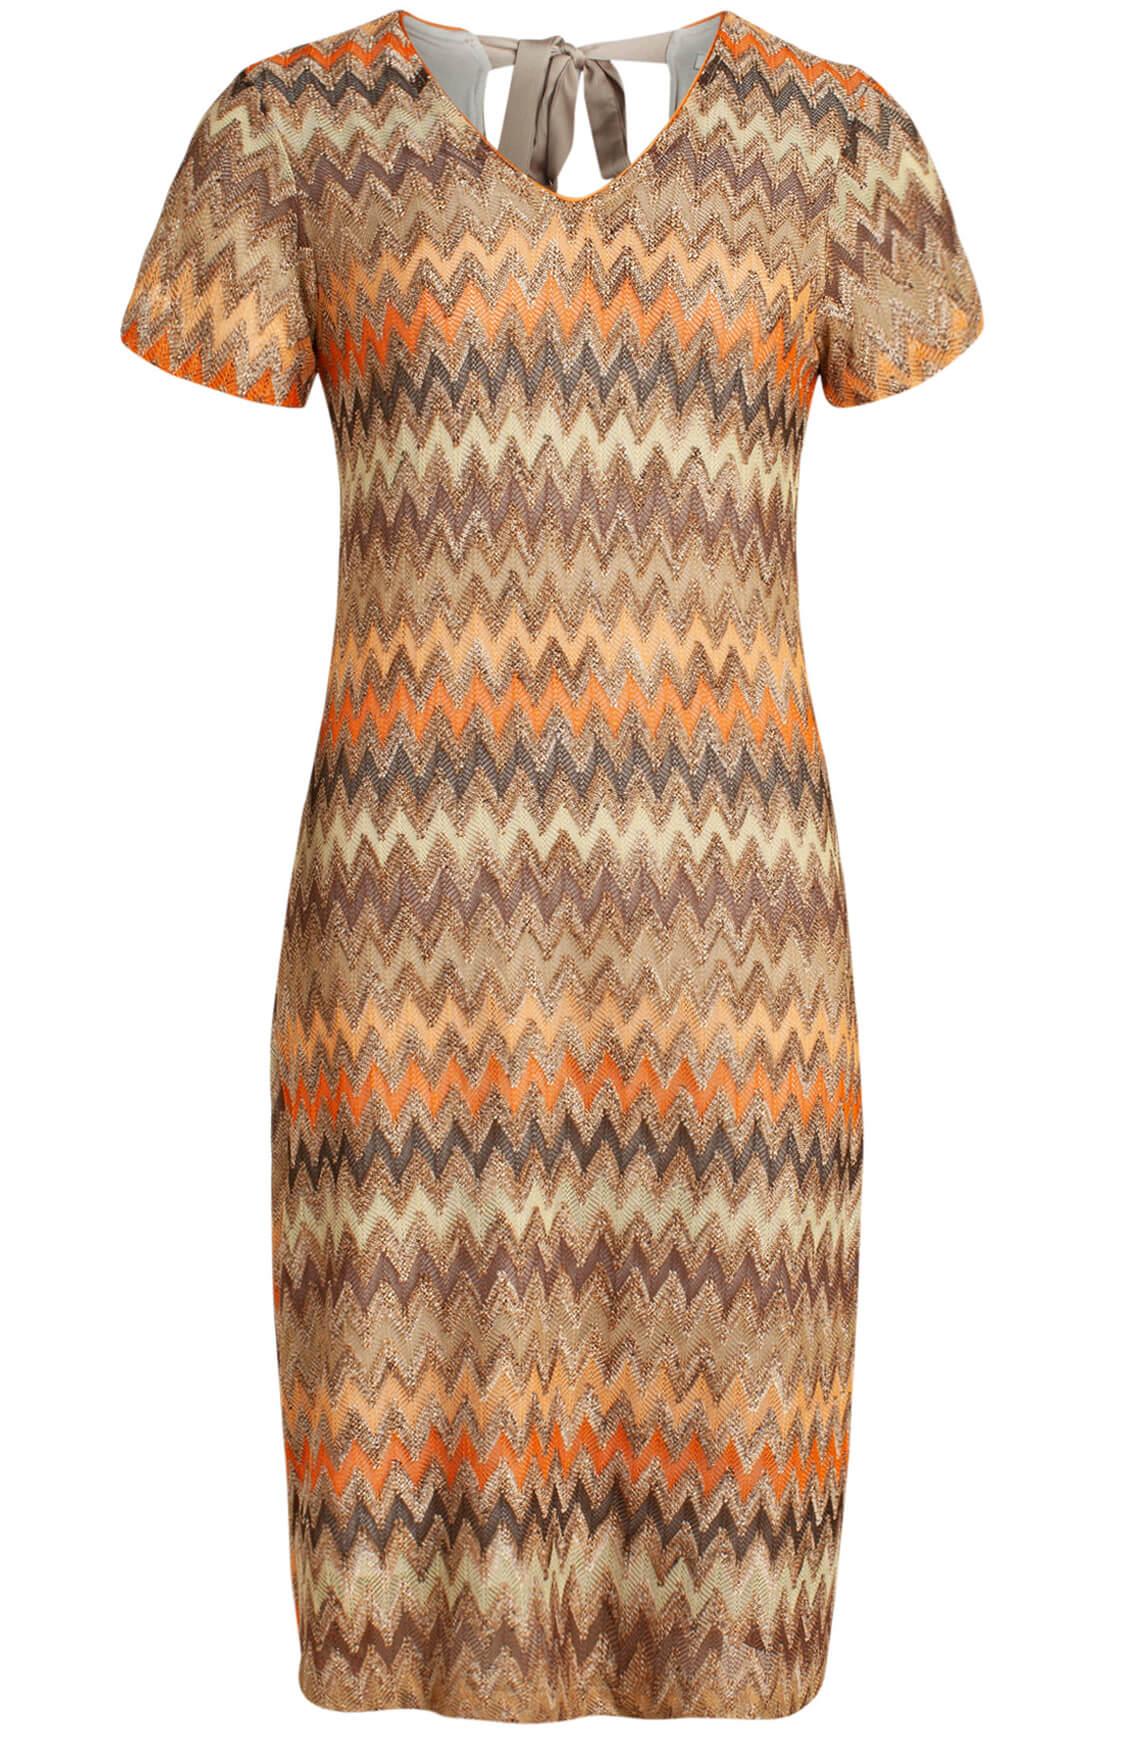 La Fée Maraboutée Dames Zigzag jurk Bruin